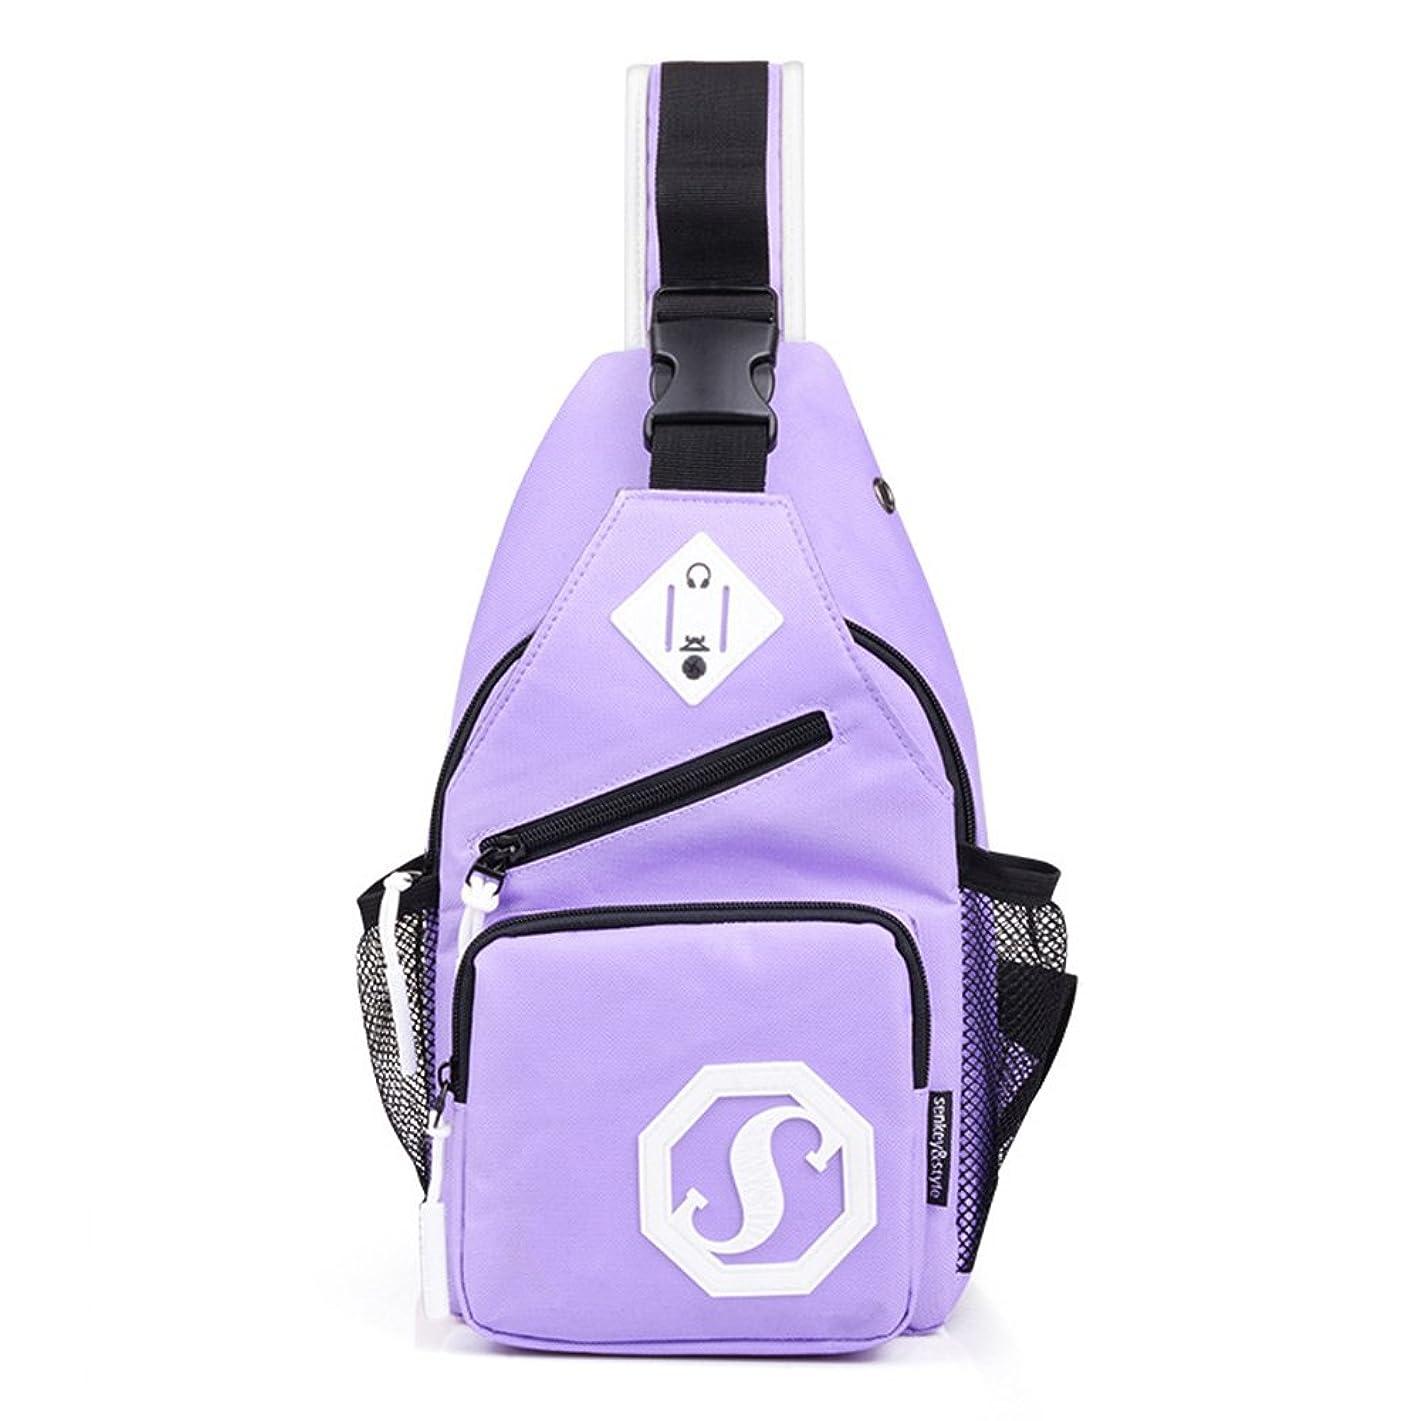 GEZICHTA Sling Bag for Man Women, Cover Pack Rucksack for Bicycle Sport Hiking Travel Camping Bookbag or Multipurpose Daypacks